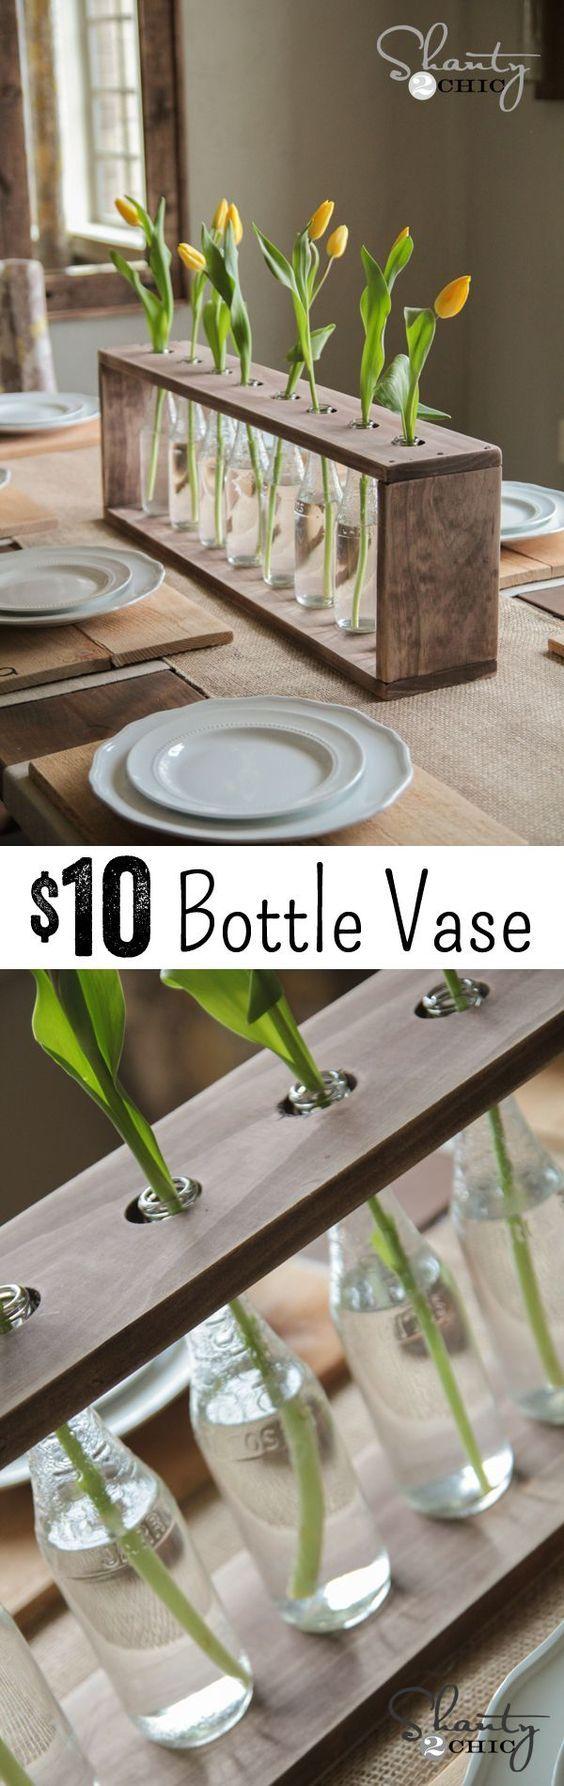 152 best Manualidades y DIY images on Pinterest | Mason jars, Jars and  Glass jars